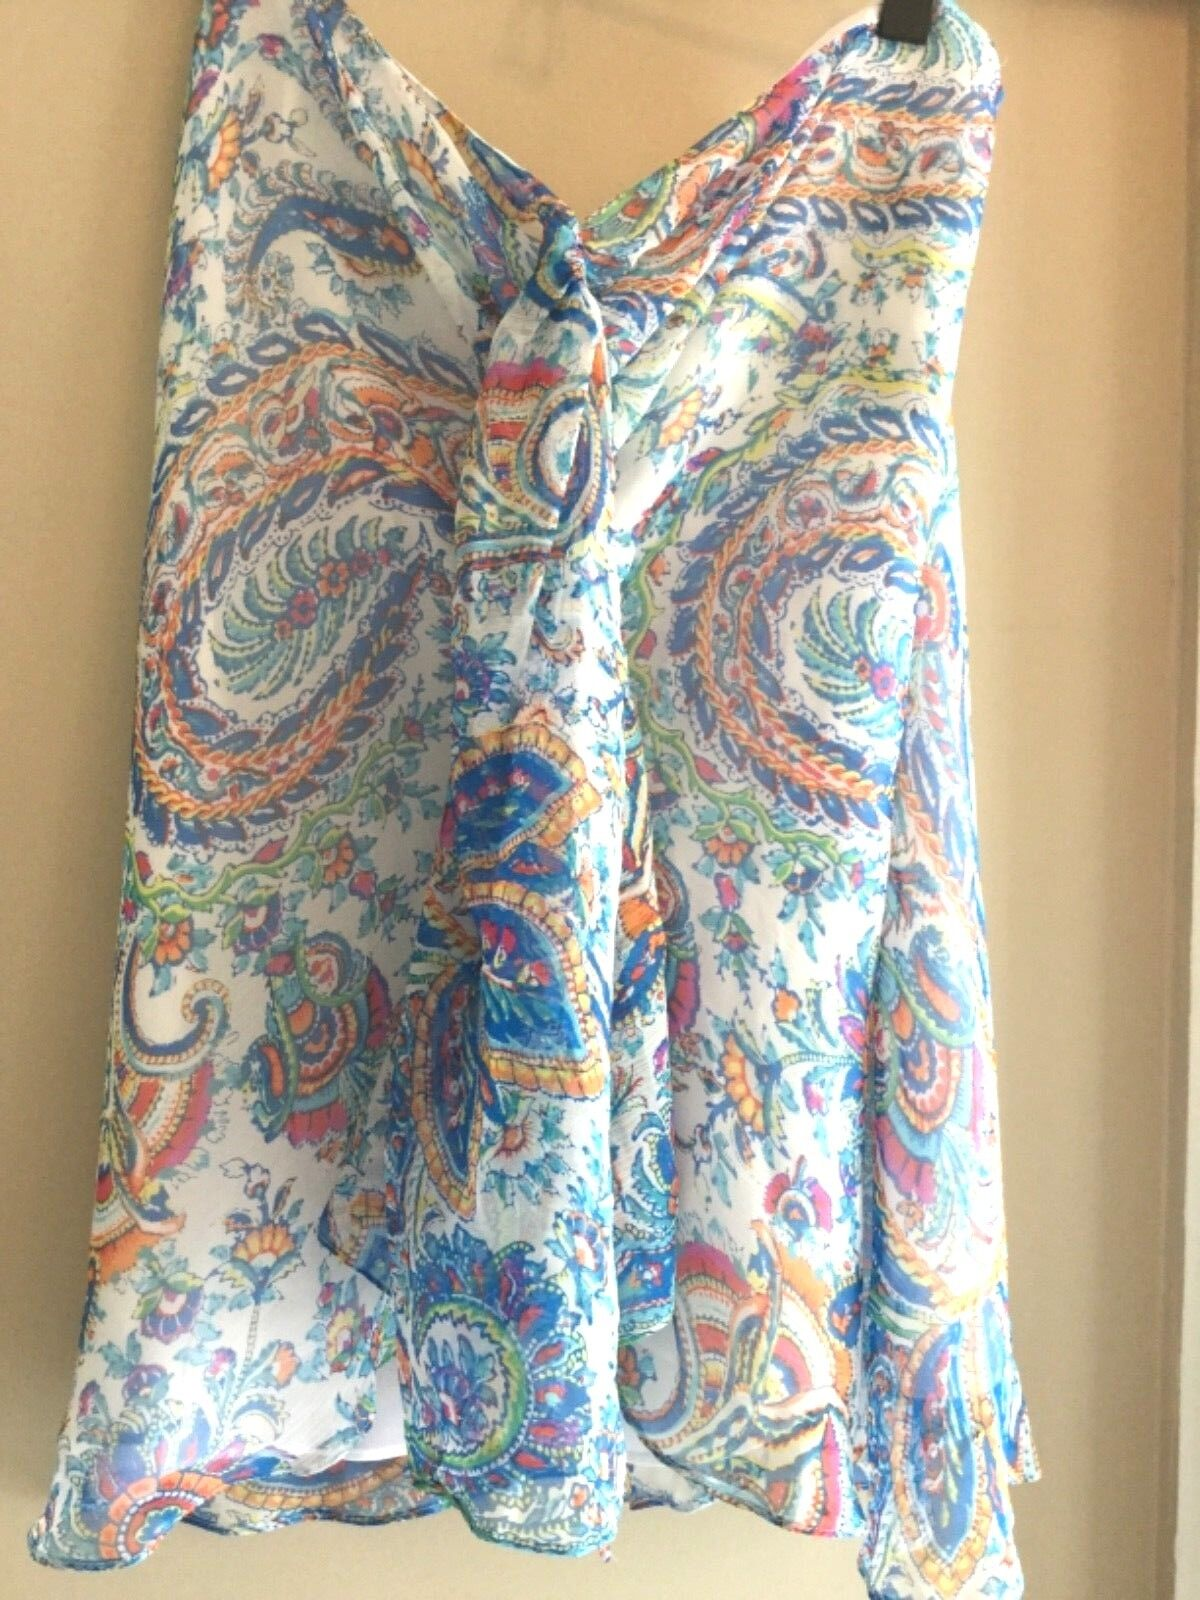 Ralph Lauren SILK ruffle halter blouse top Tunic Weiß  Blau  multi paisley L